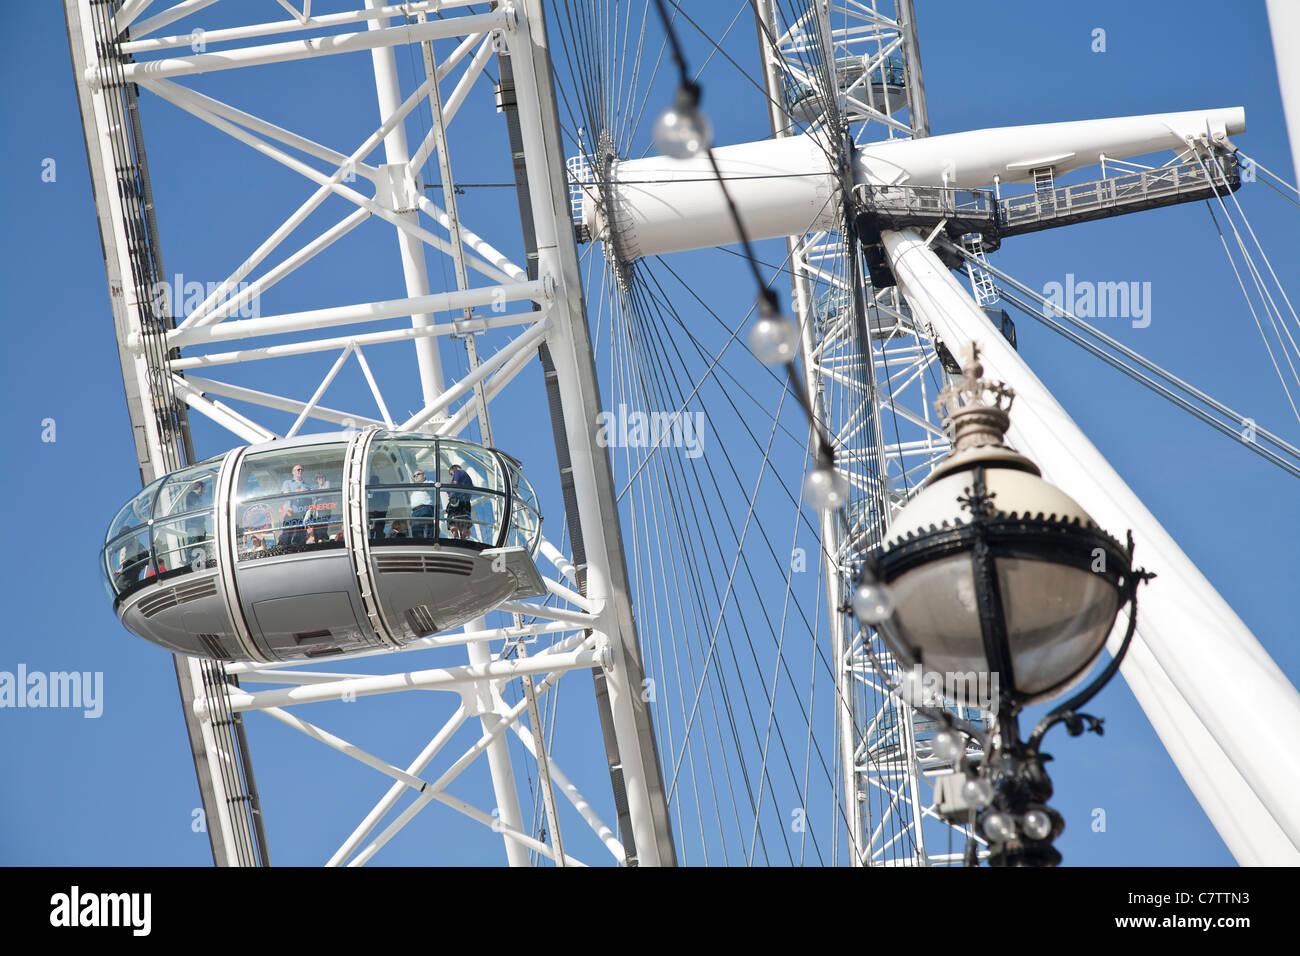 Passenger capsule on the London Eye, the Millennium Wheel - Stock Image